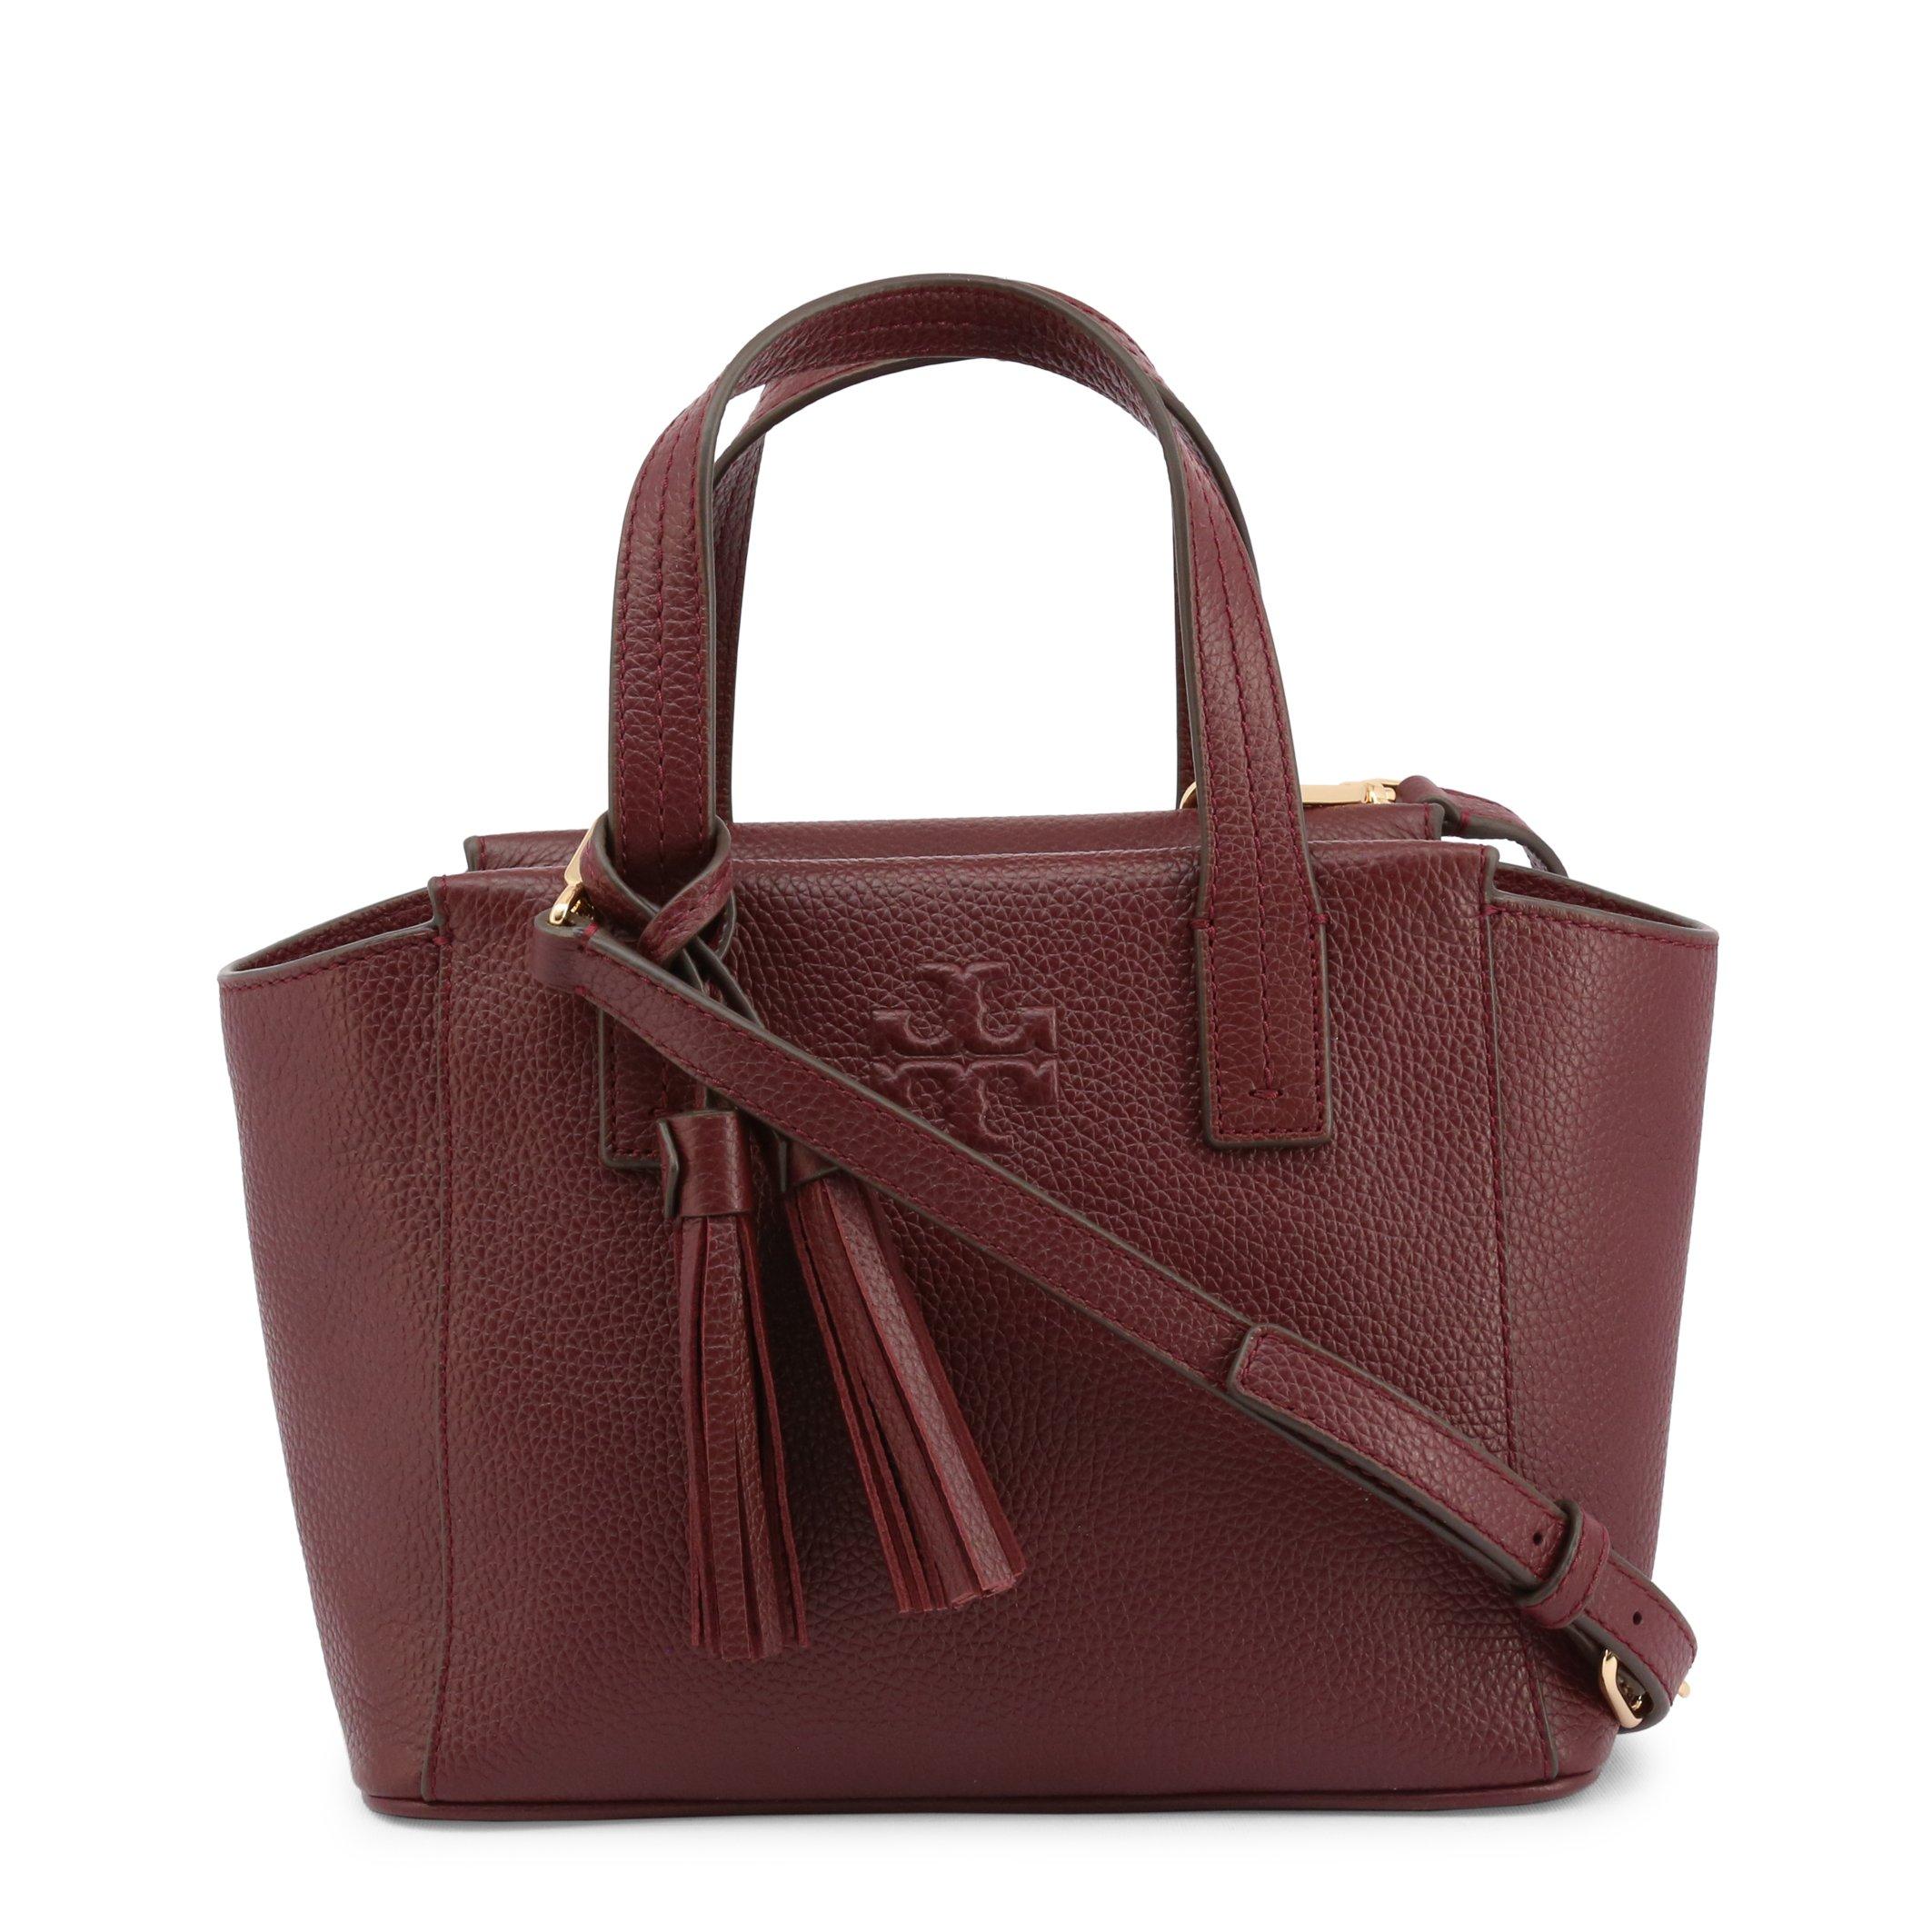 Tory Burch Women's Handbag Various Colours 77165 - red NOSIZE